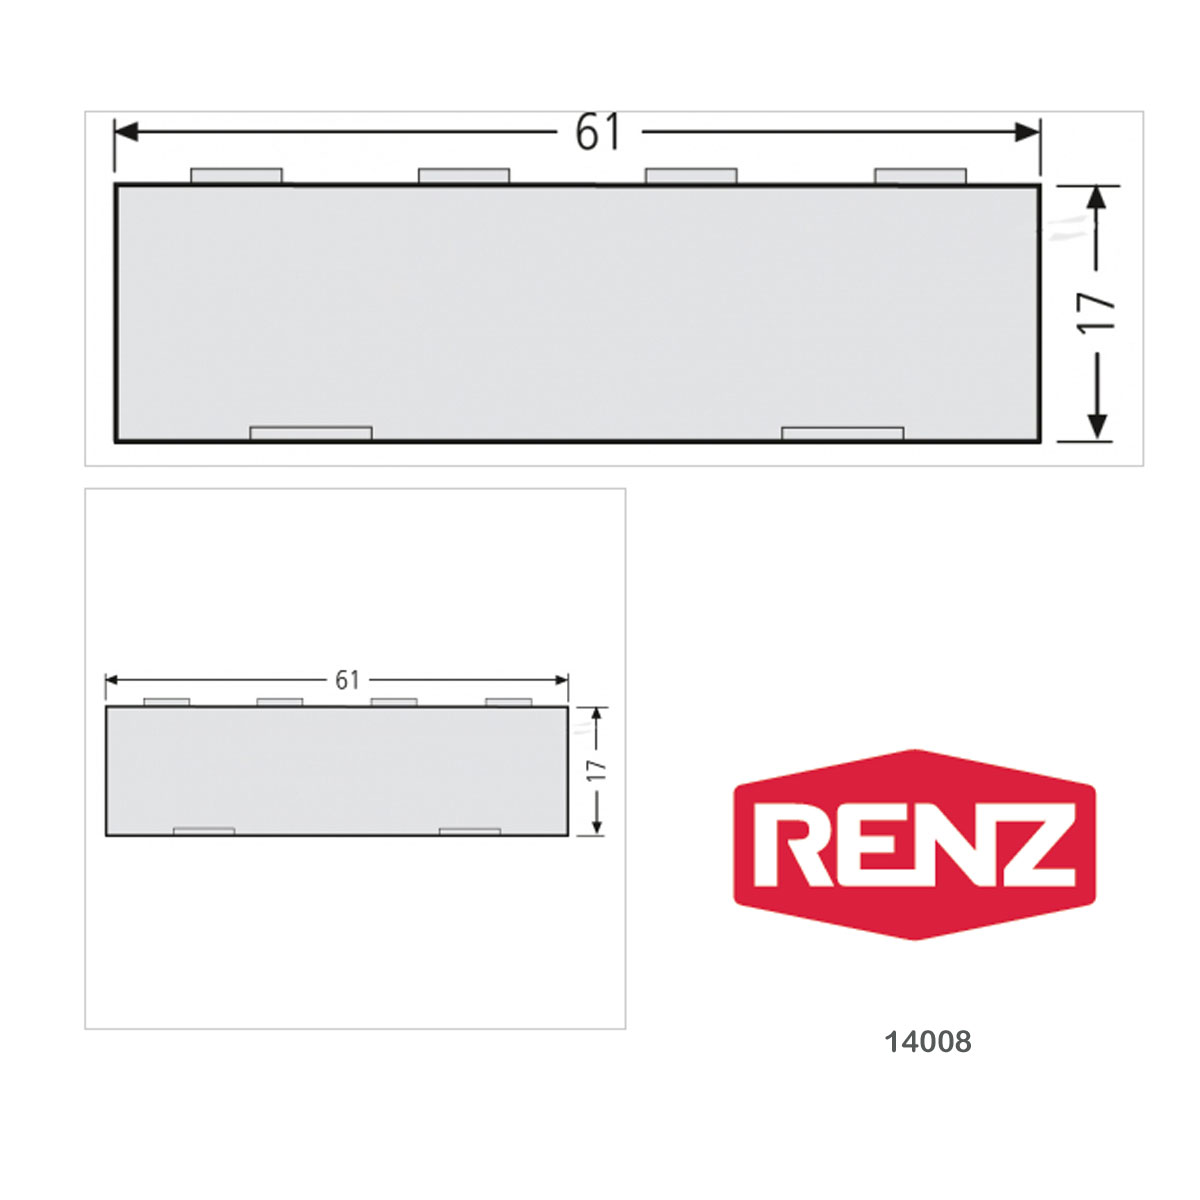 Ritzenhoff /& Breker Kaffeebecher Pistolengriff Love Porzellan 330ml 091441